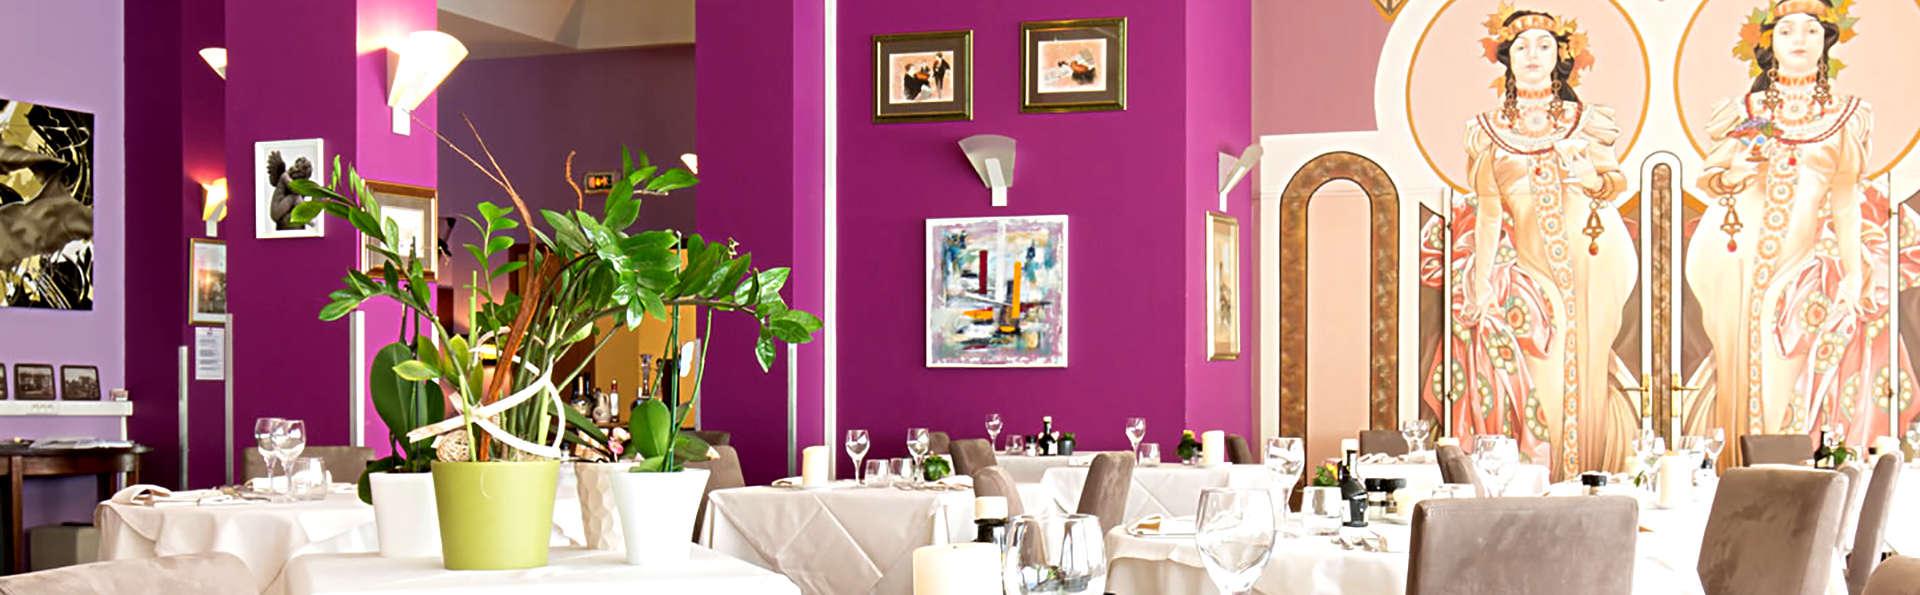 The Originals City, Hôtel de l'Ange, Colmar Sud (Inter-Hotel) - EDIT_NEW_RESTAURANT.jpg